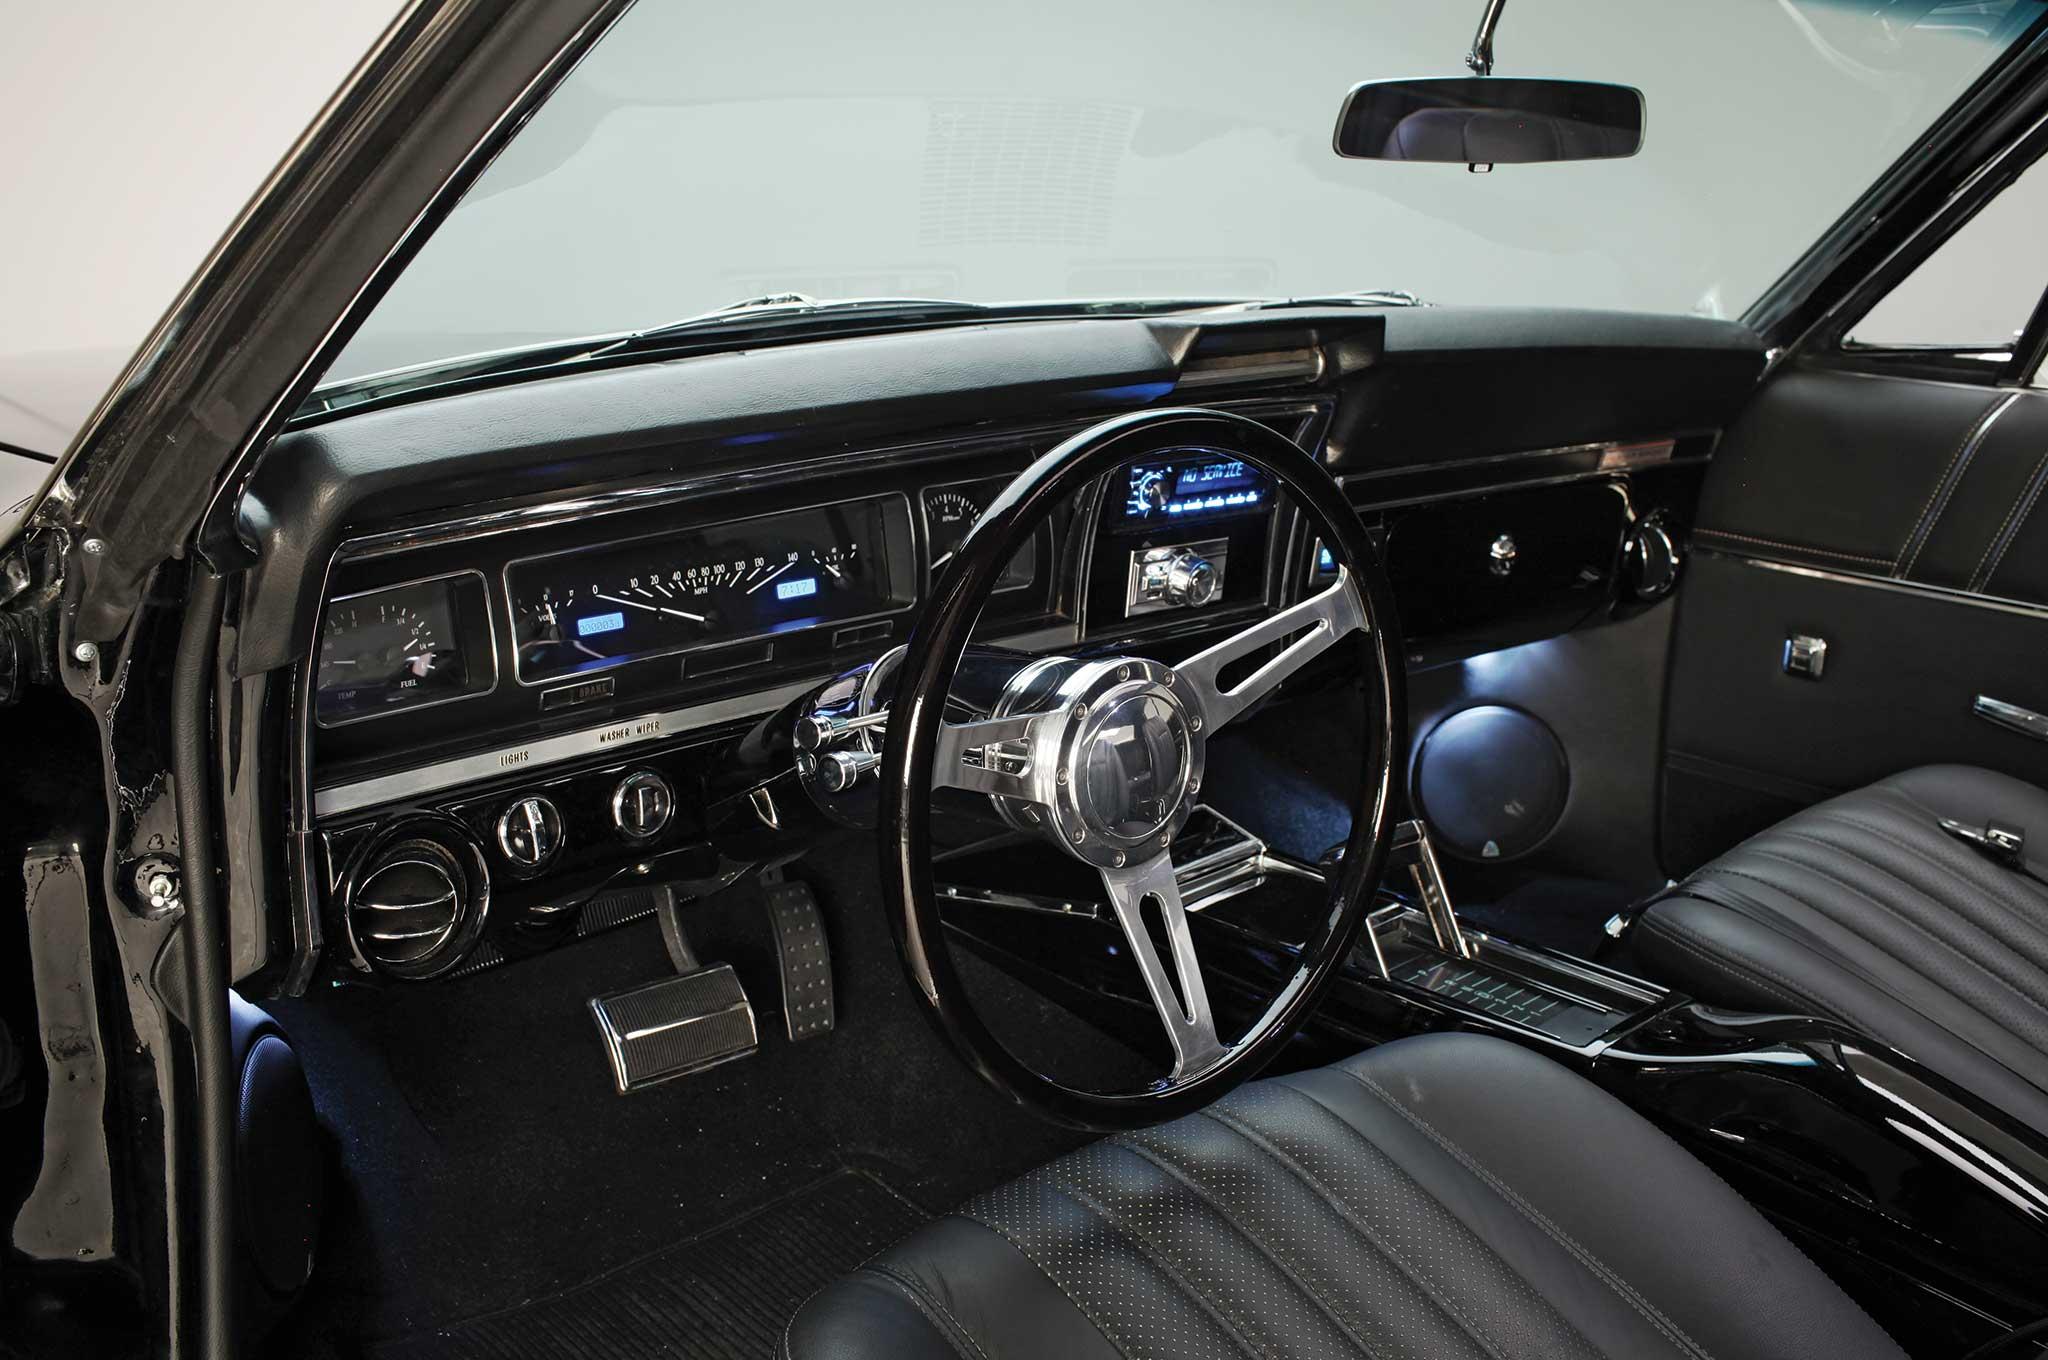 1968-chevrolet-impala-ss-steering-wheel